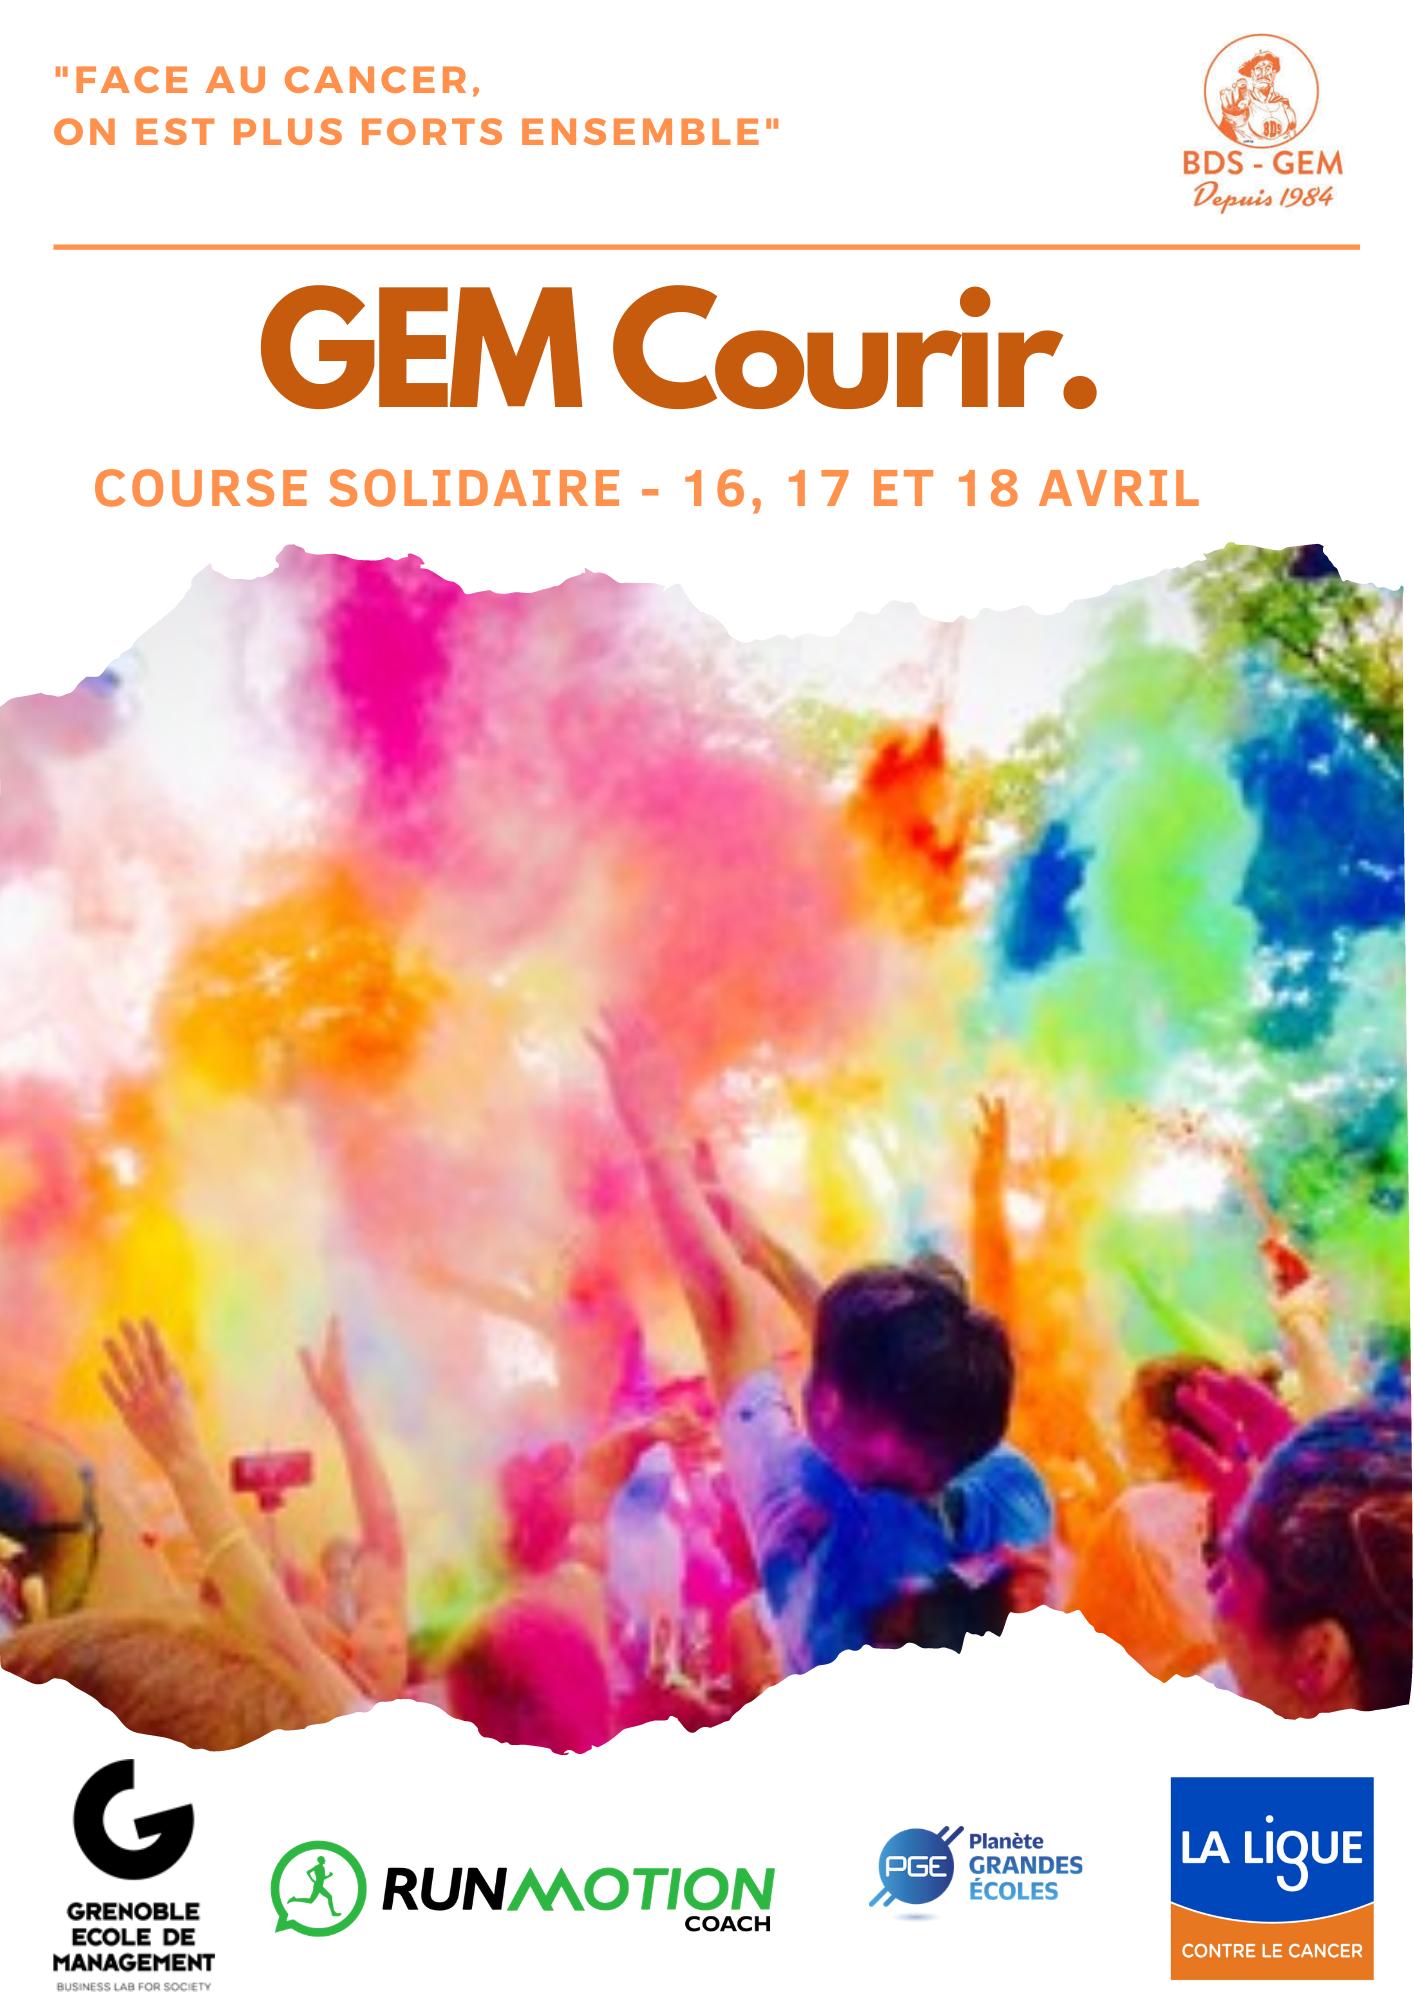 GEM Courir Ligue contre le cancer avril 2021